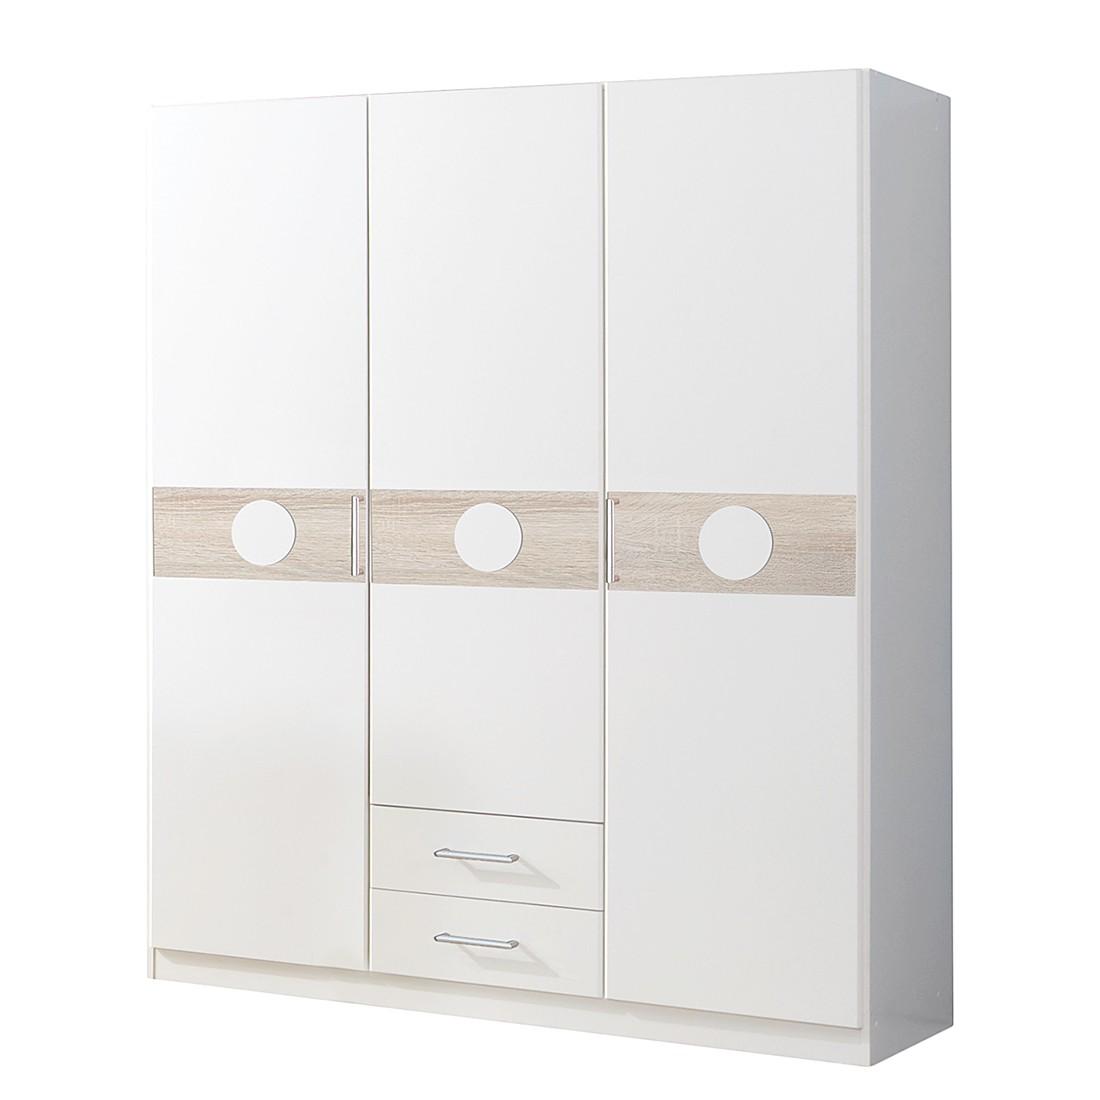 Armoire à vêtements Simba II - Blanc alpin / Chêne brut de sciage, Wimex